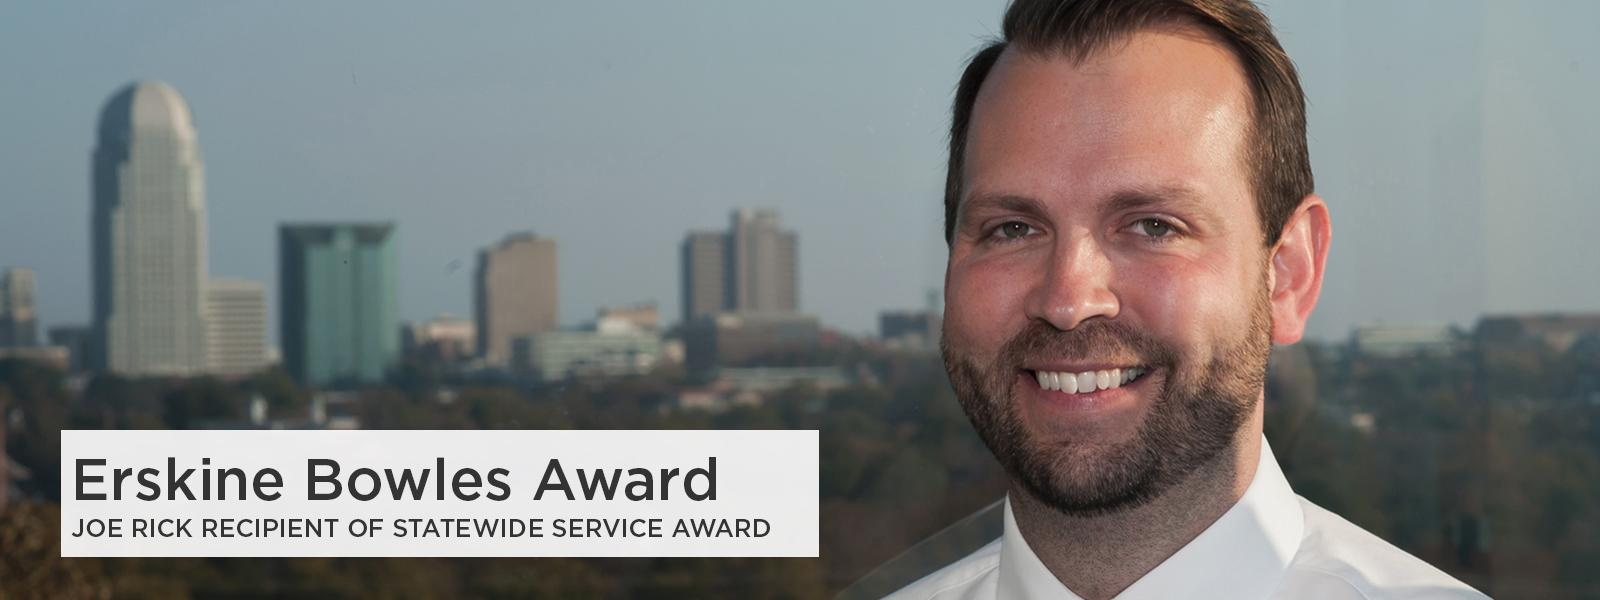 Joe Rick receives Erskine Bowles Award